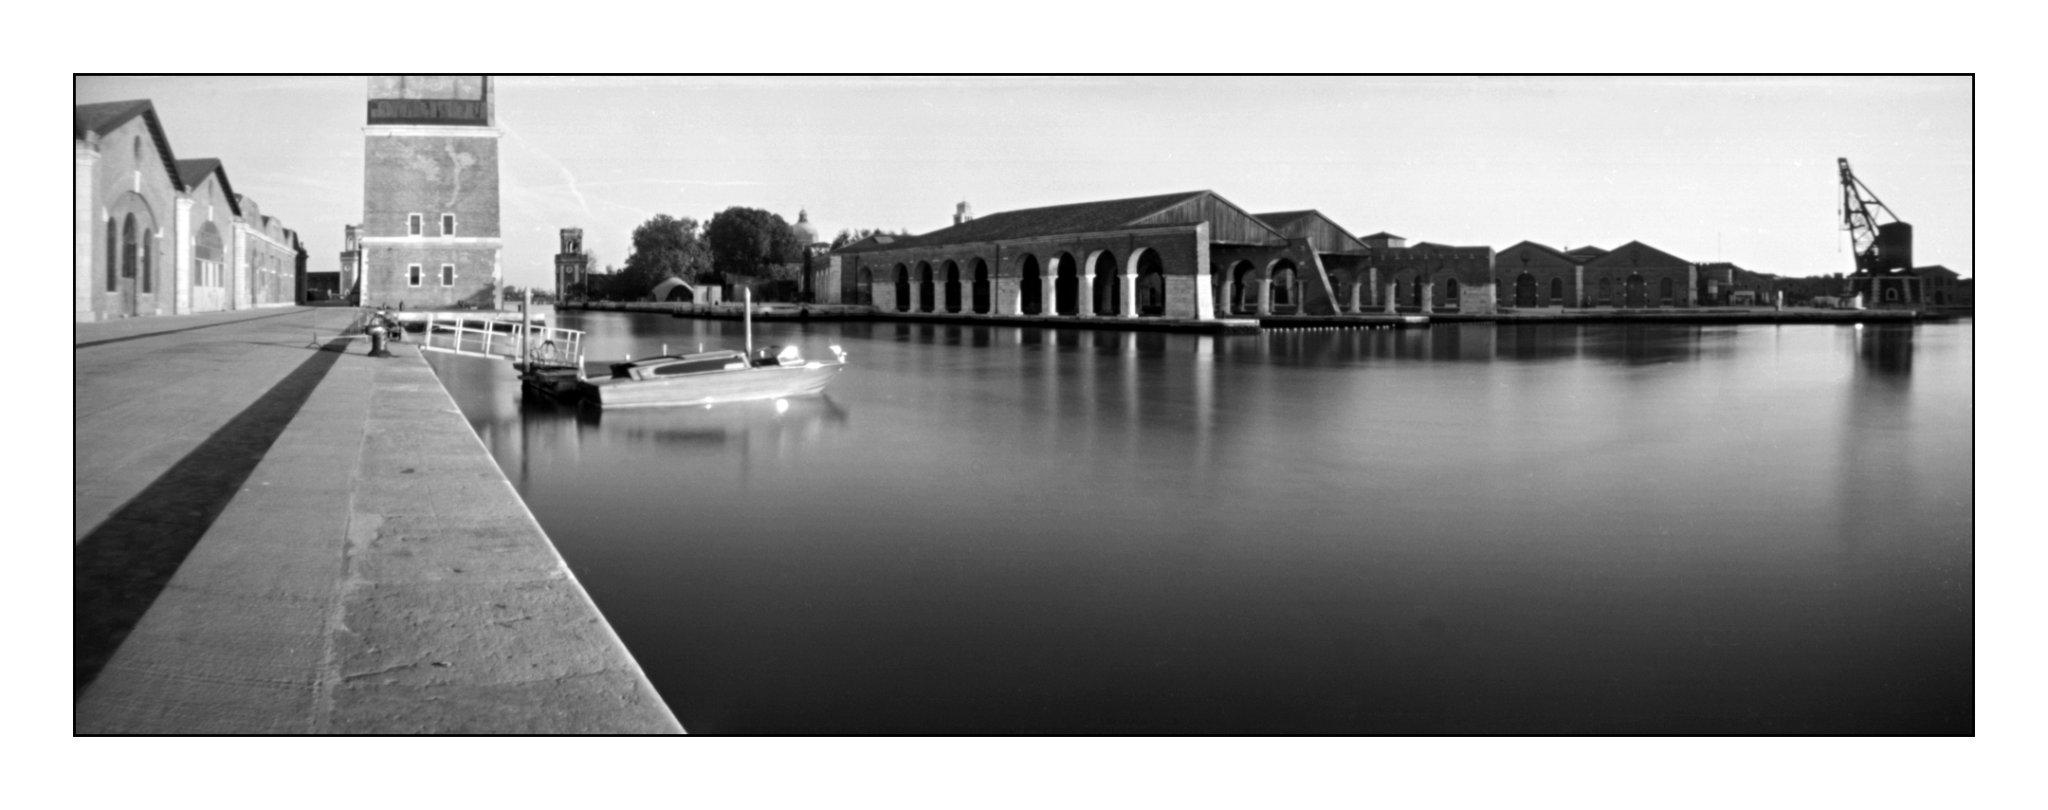 Venedig - Arsenale, Lochkamera 16x7 analog: Venedig, Fotograf: Steffen Lohse